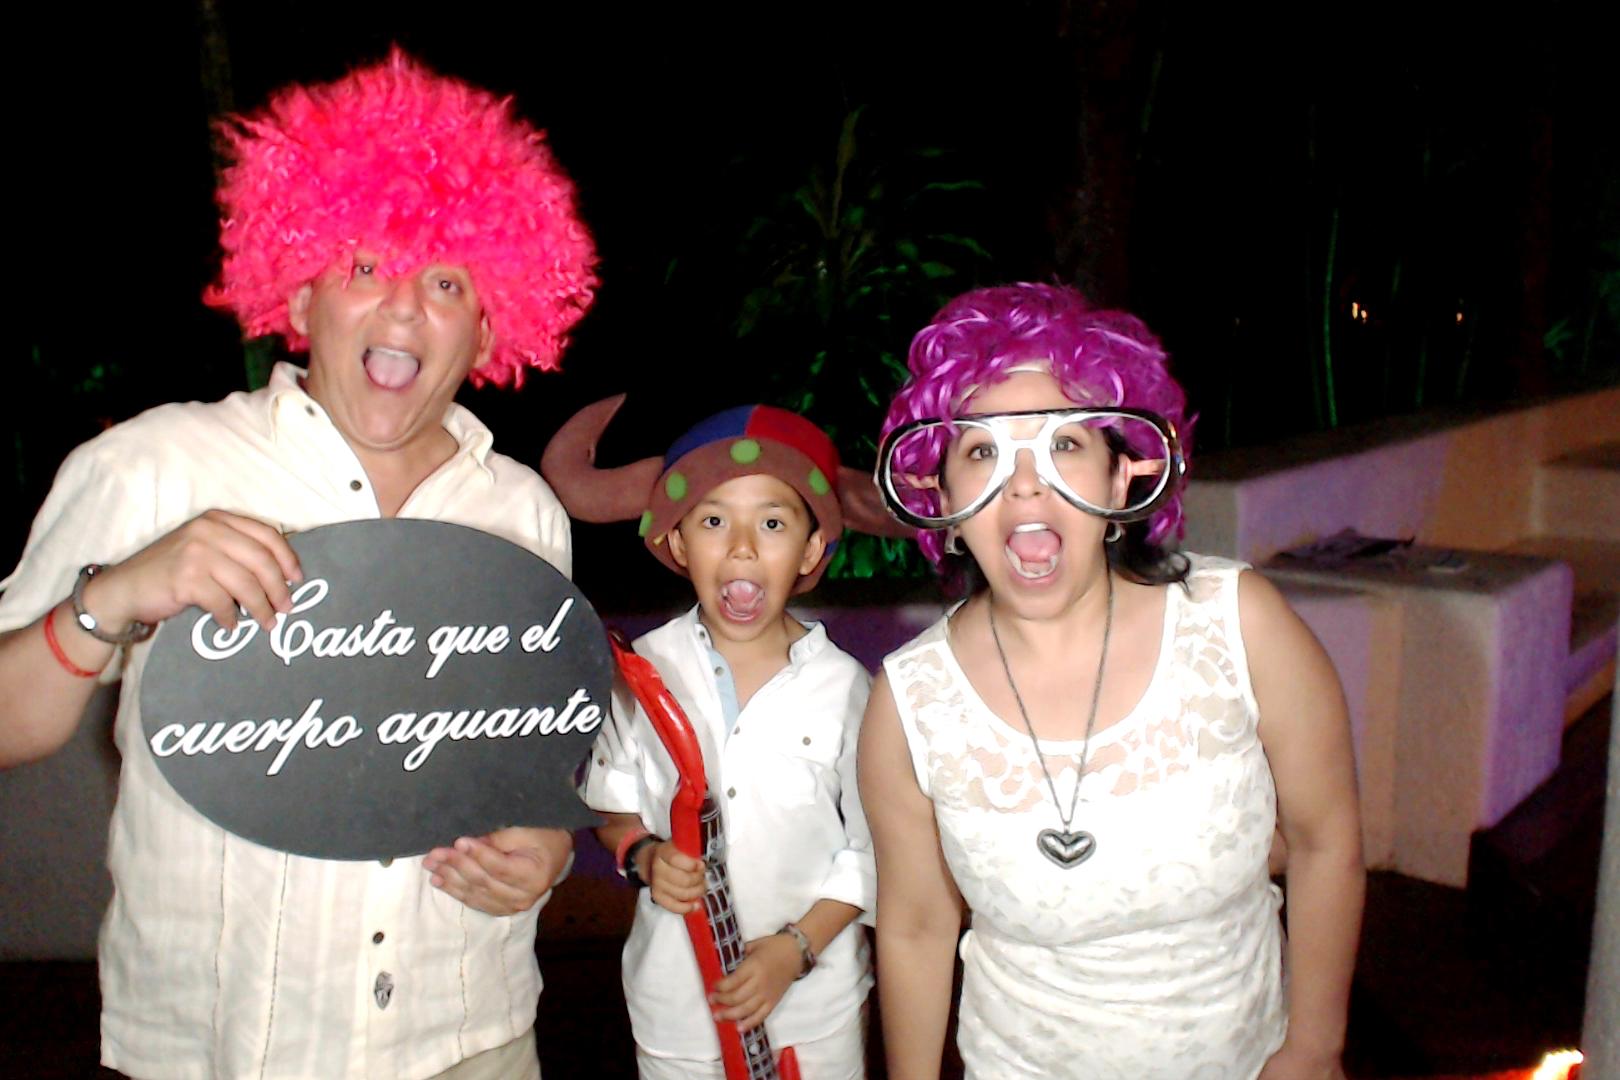 PlayadelCarmenPhotoBoothMexico0031.JPG